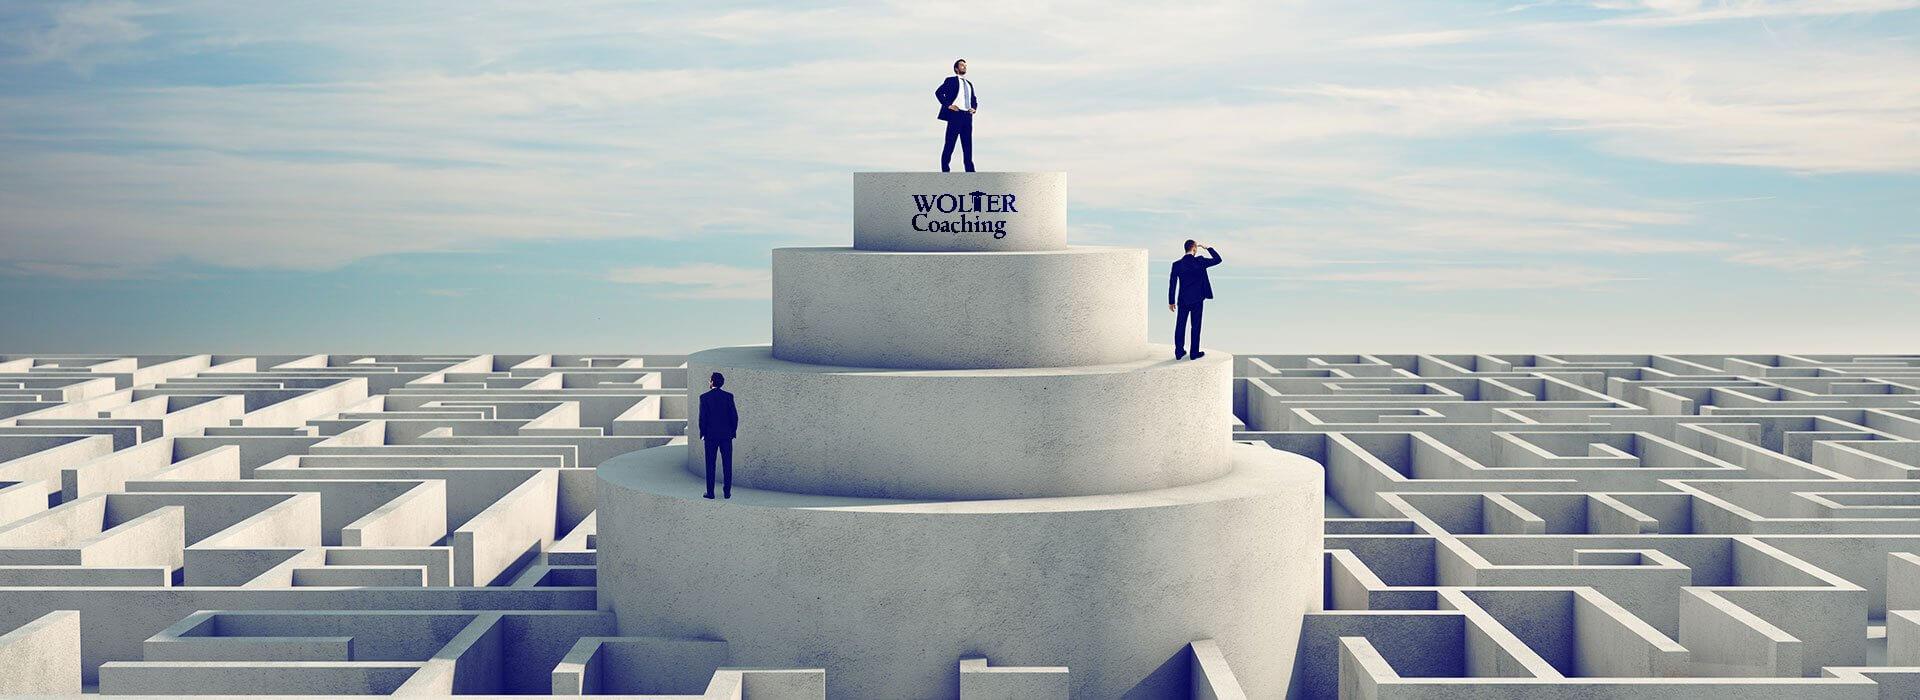 Bild Erfolg | Wolter Coaching